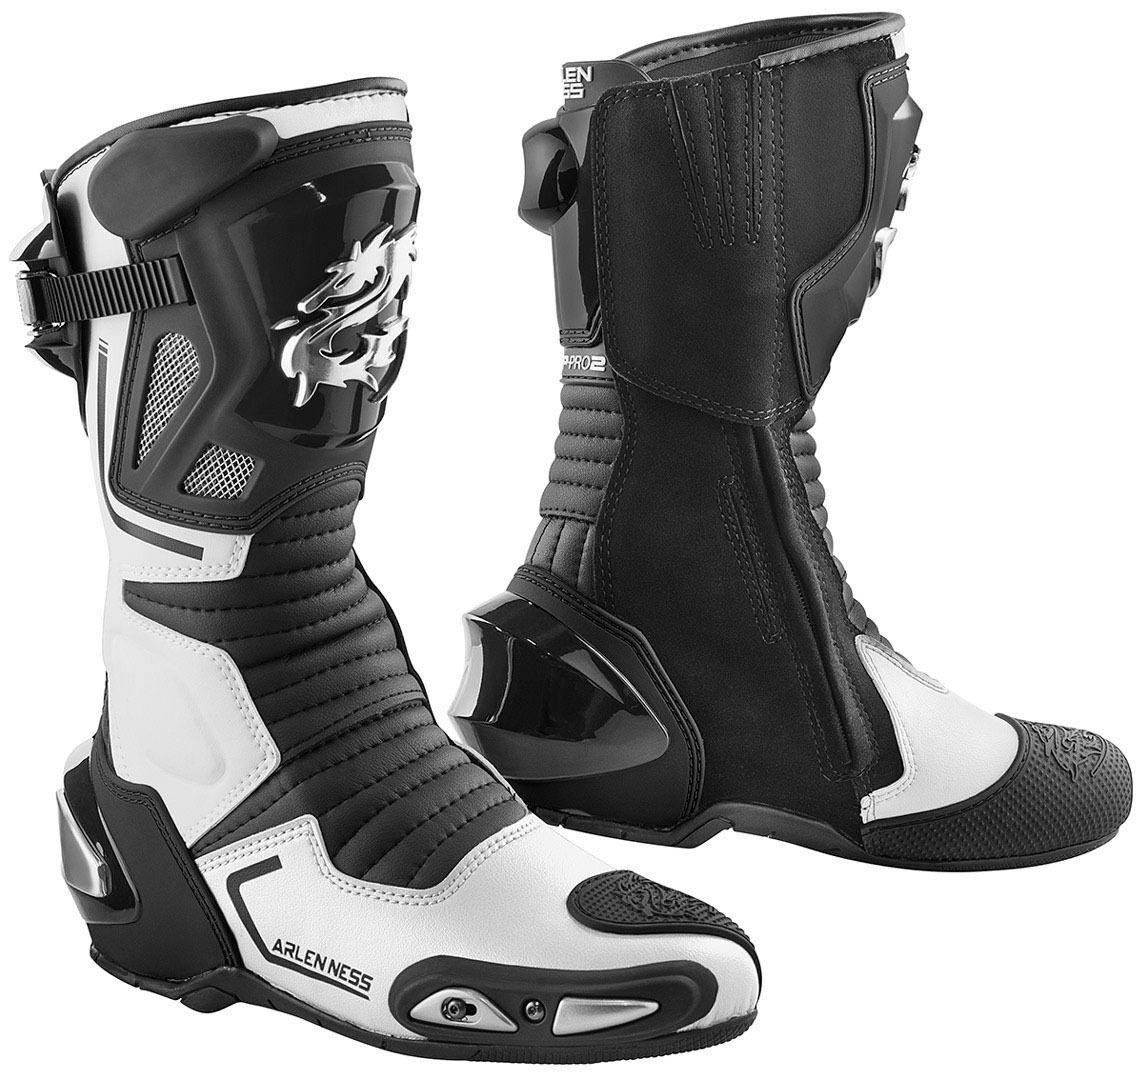 Arlen Ness Sugello Bottes de moto Noir Blanc taille : 41